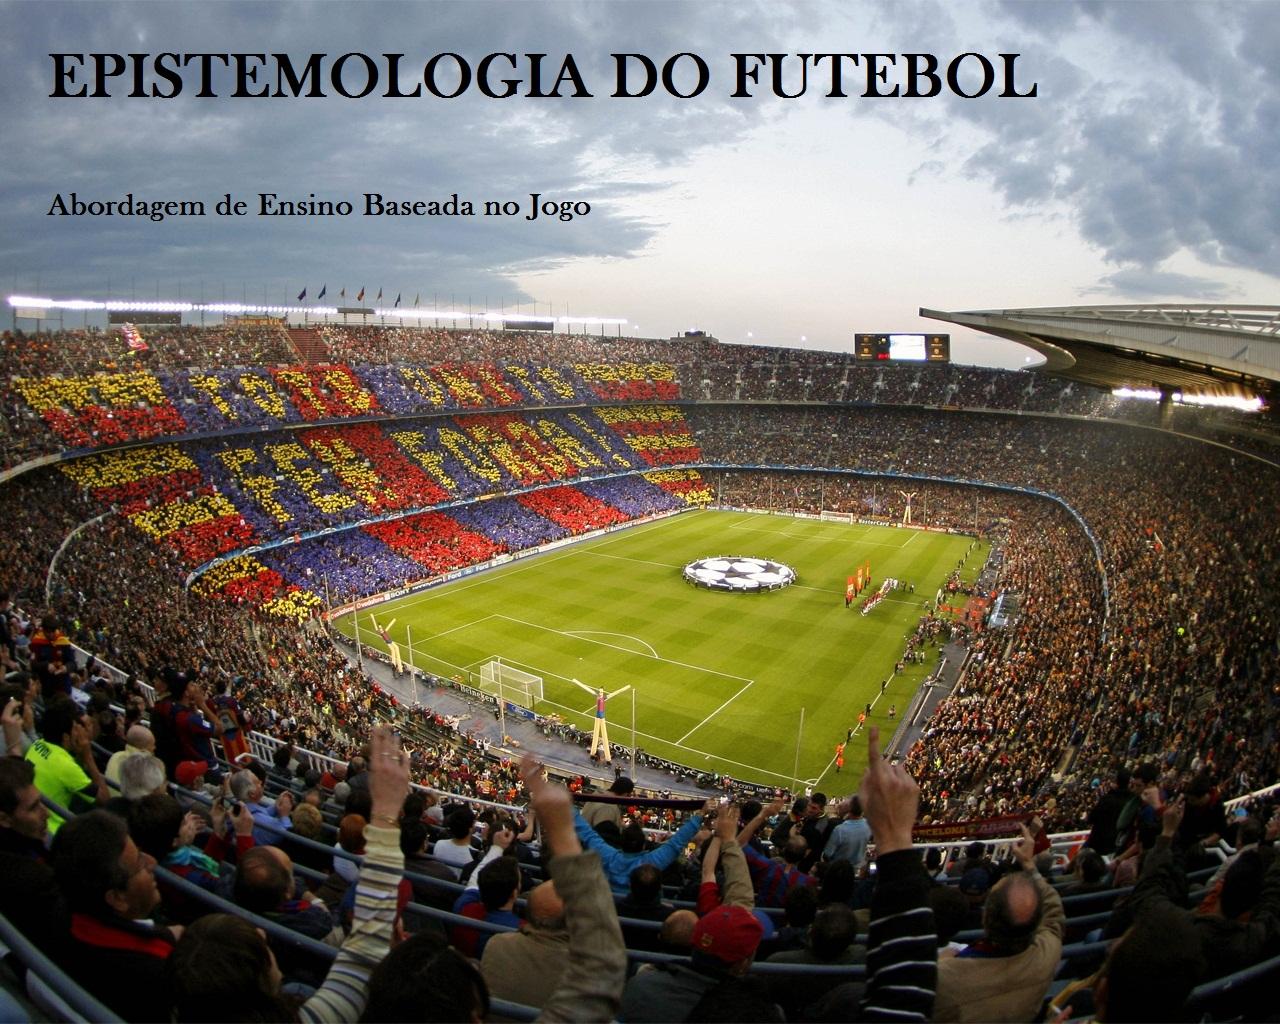 EPISTEMOLOGIA DO FUTEBOL